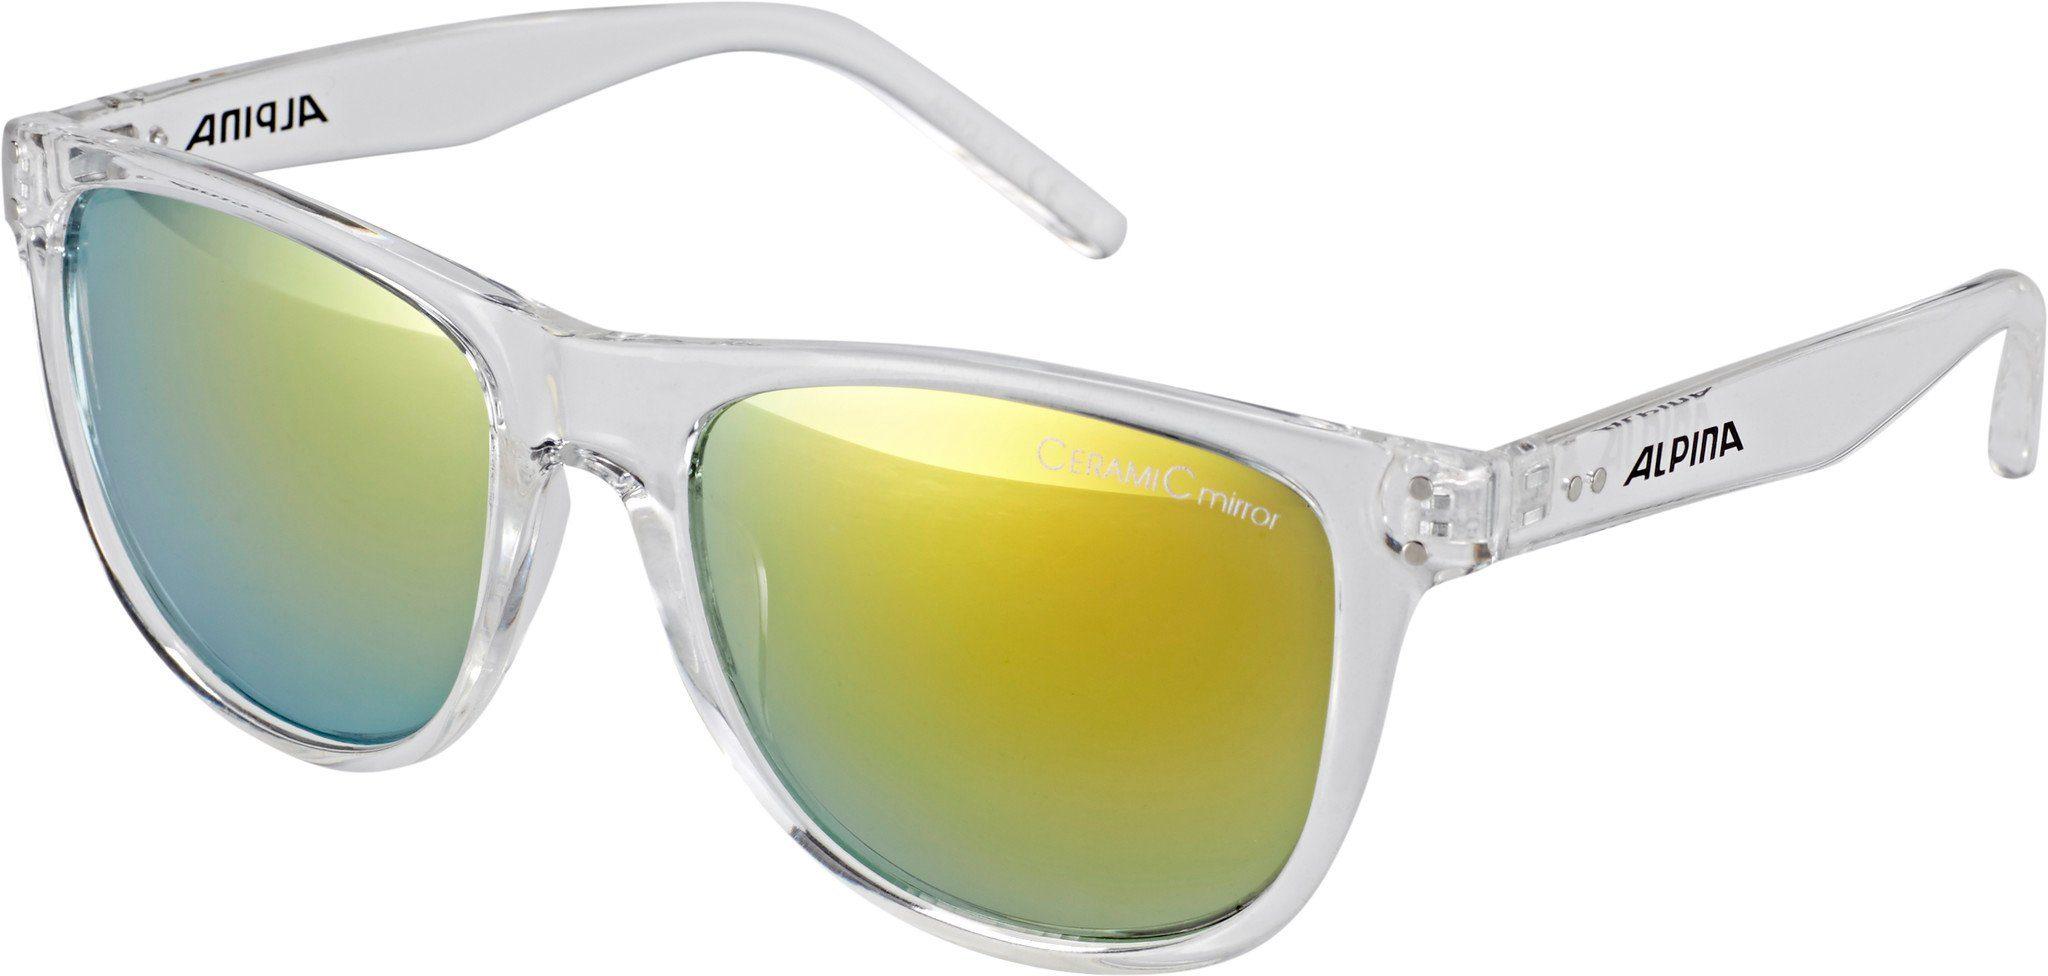 Alpina Sportbrille »Ranom«, weiß, transparent